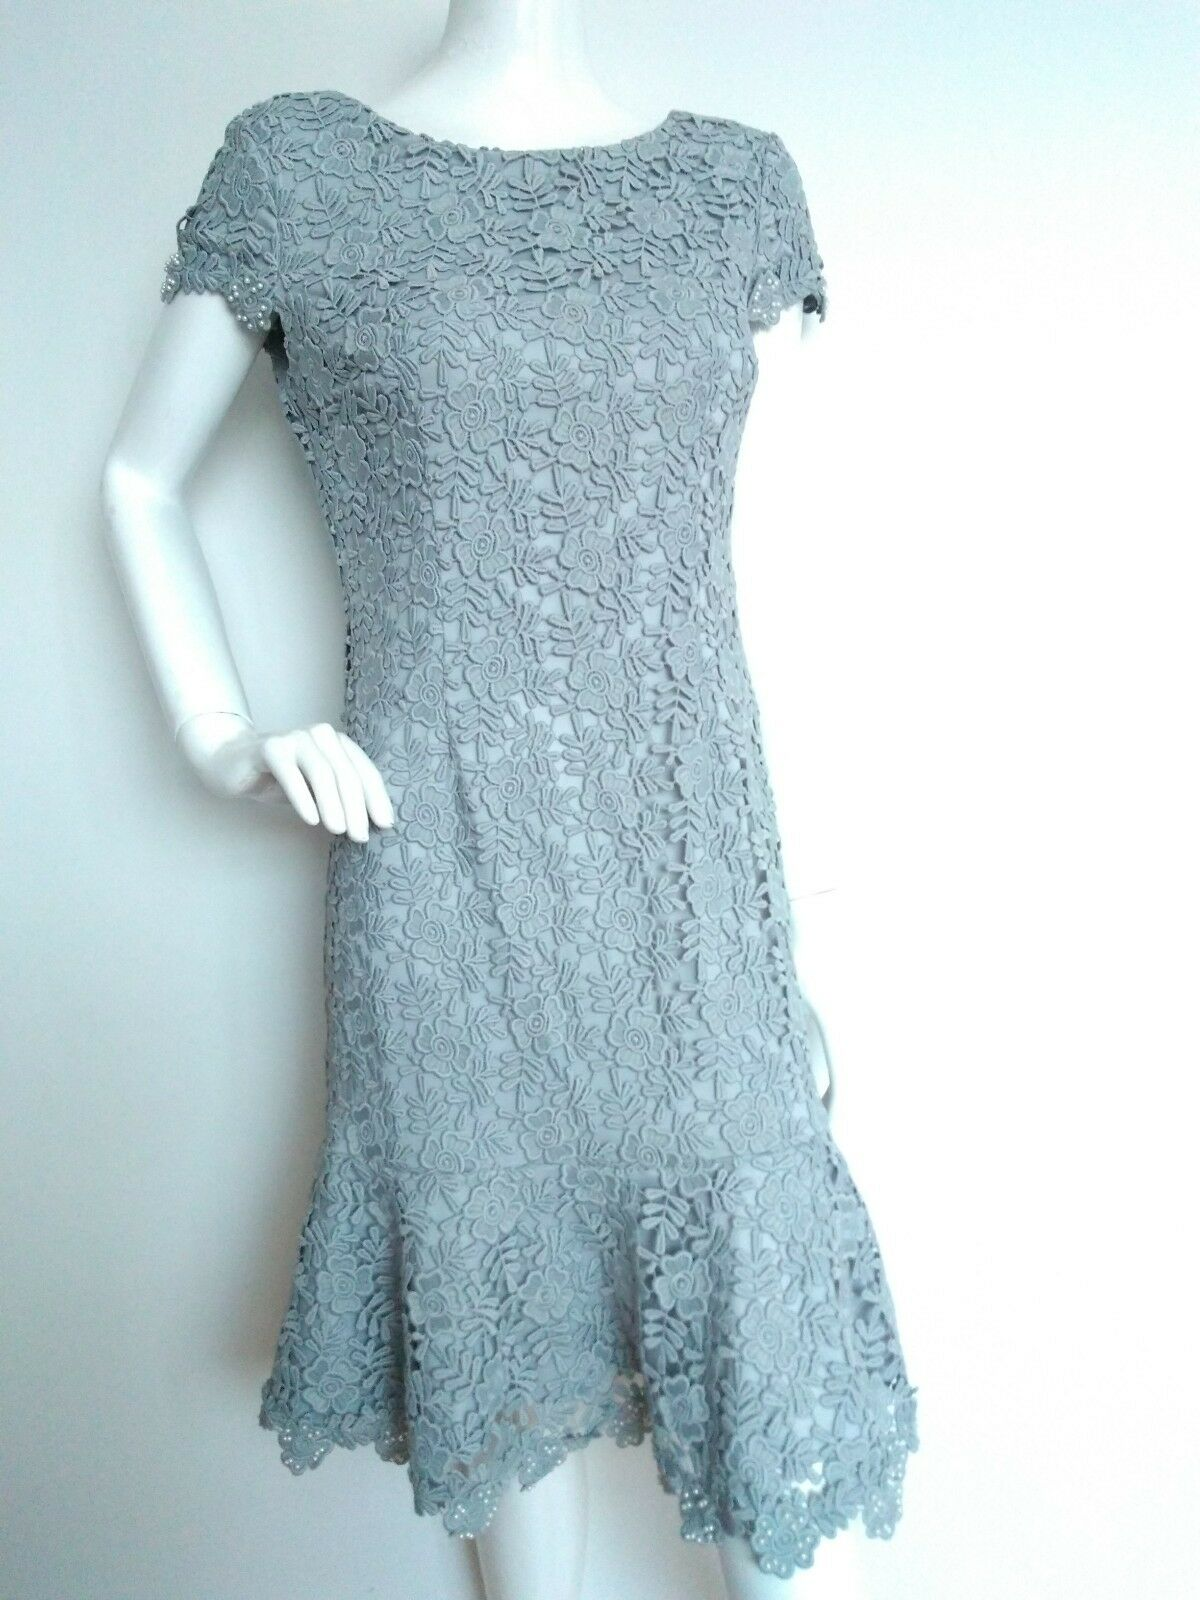 Designer GINA BACCONI lace dress Größe 12 --NEW WITH TAGS-- grau knee length